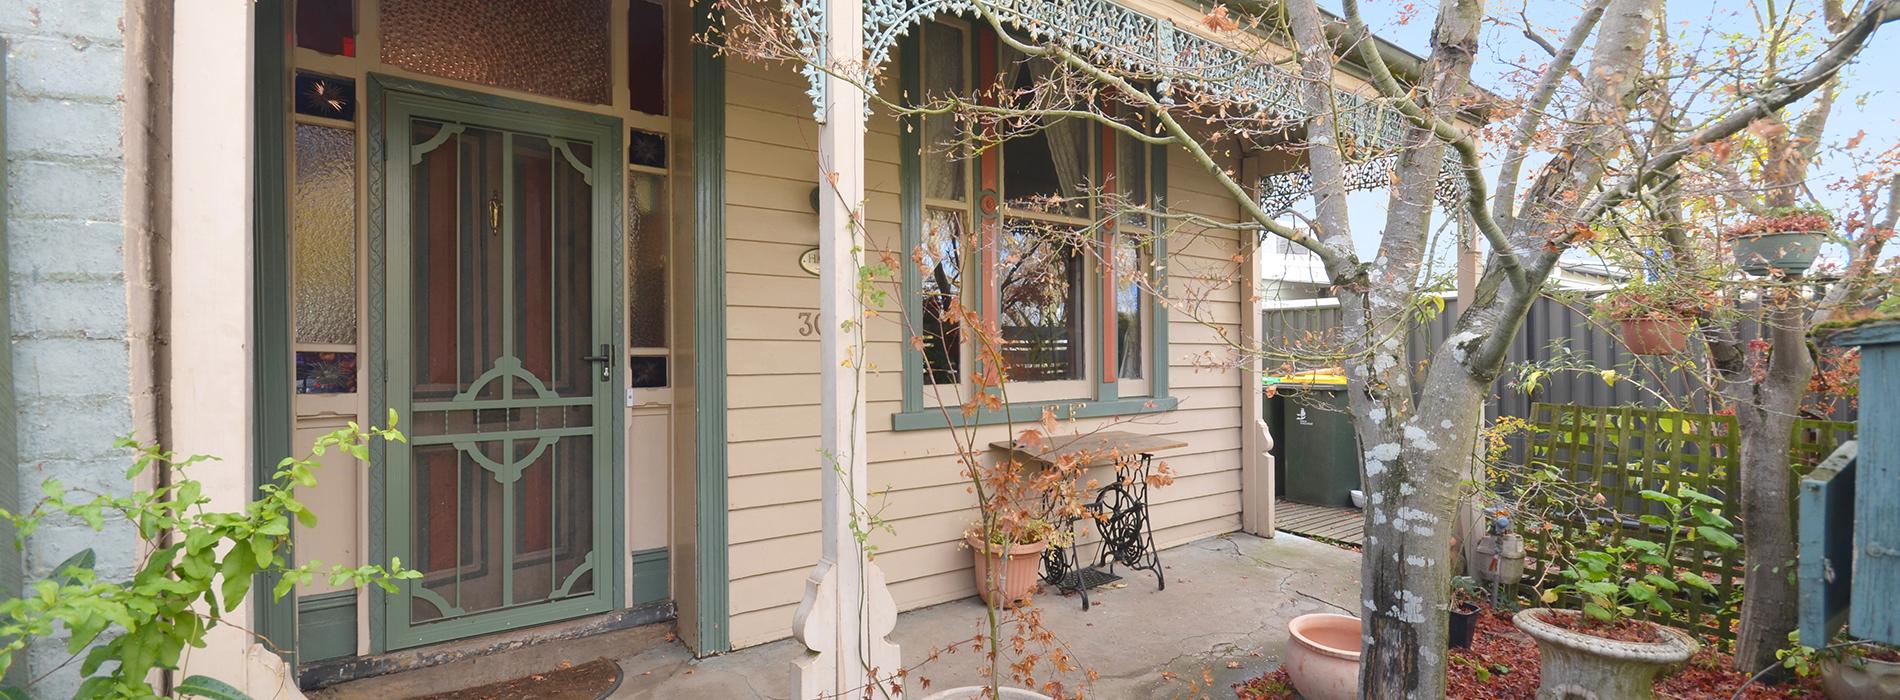 304 Urquhart Street, Ballarat